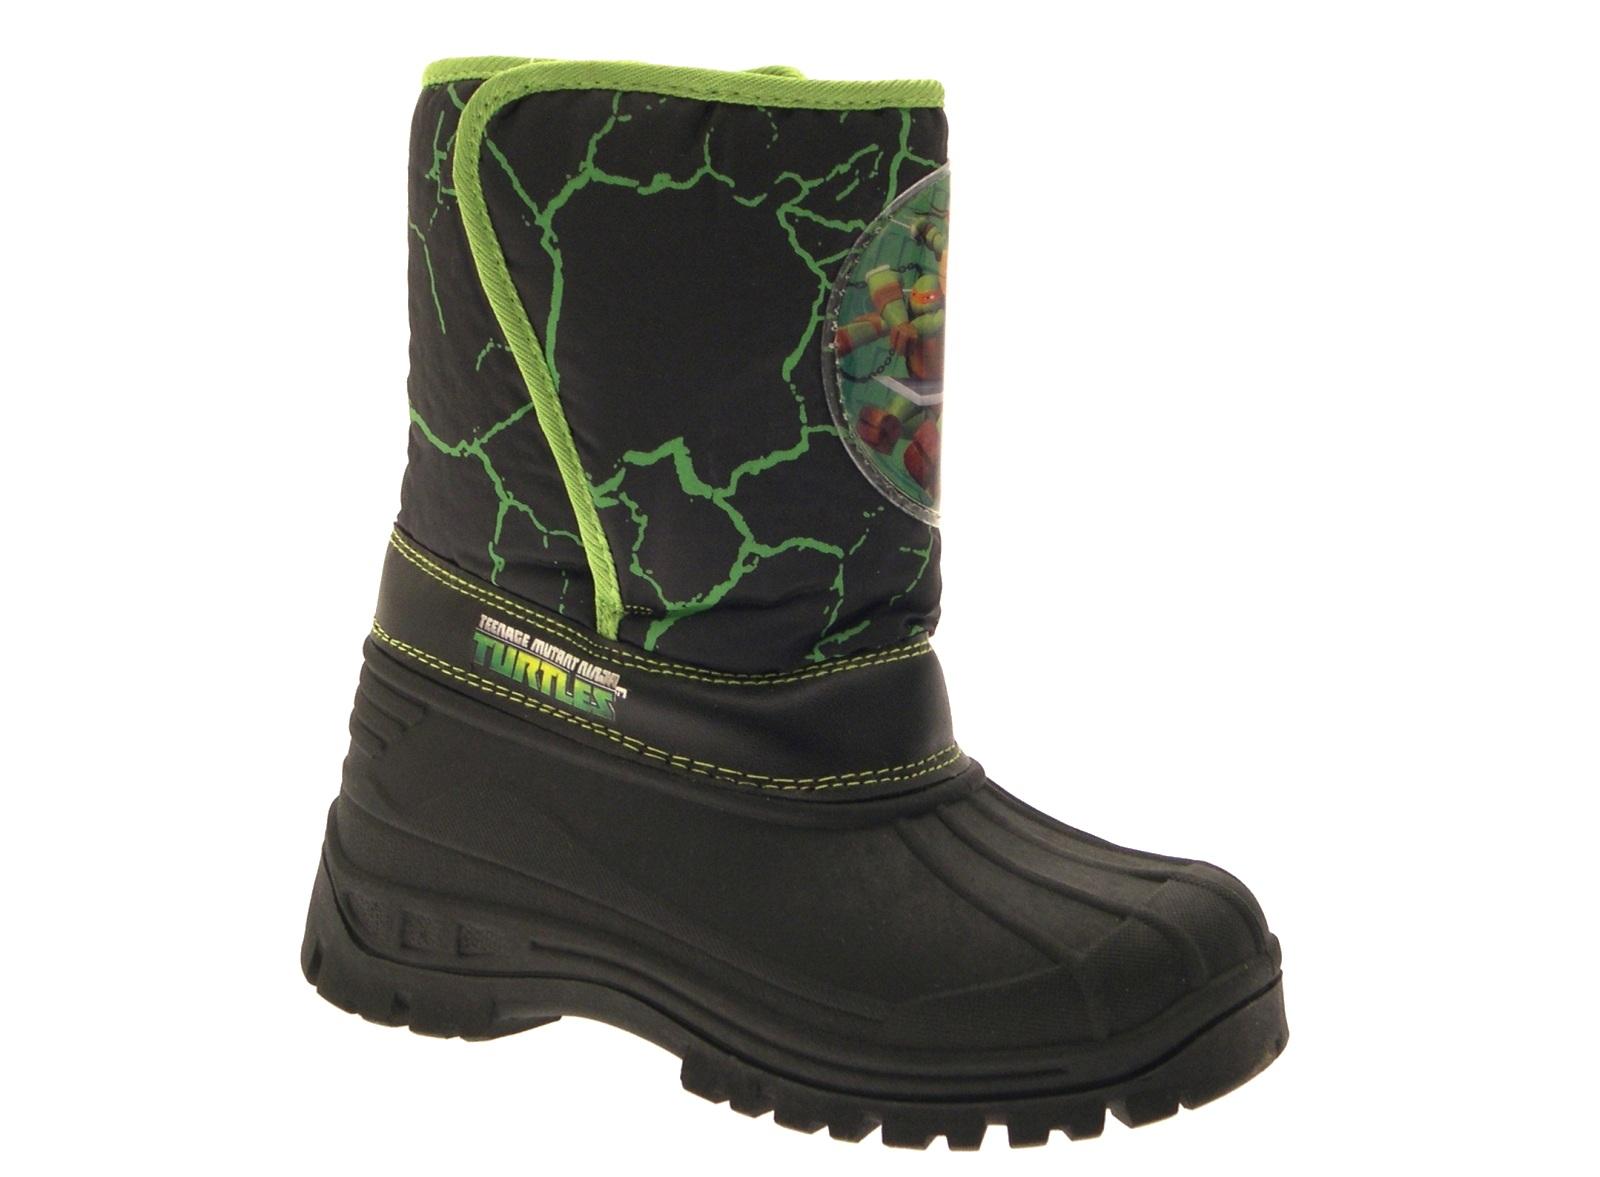 Kids Boys Girls Disney Waterproof Rain Snow Boots Tie Top